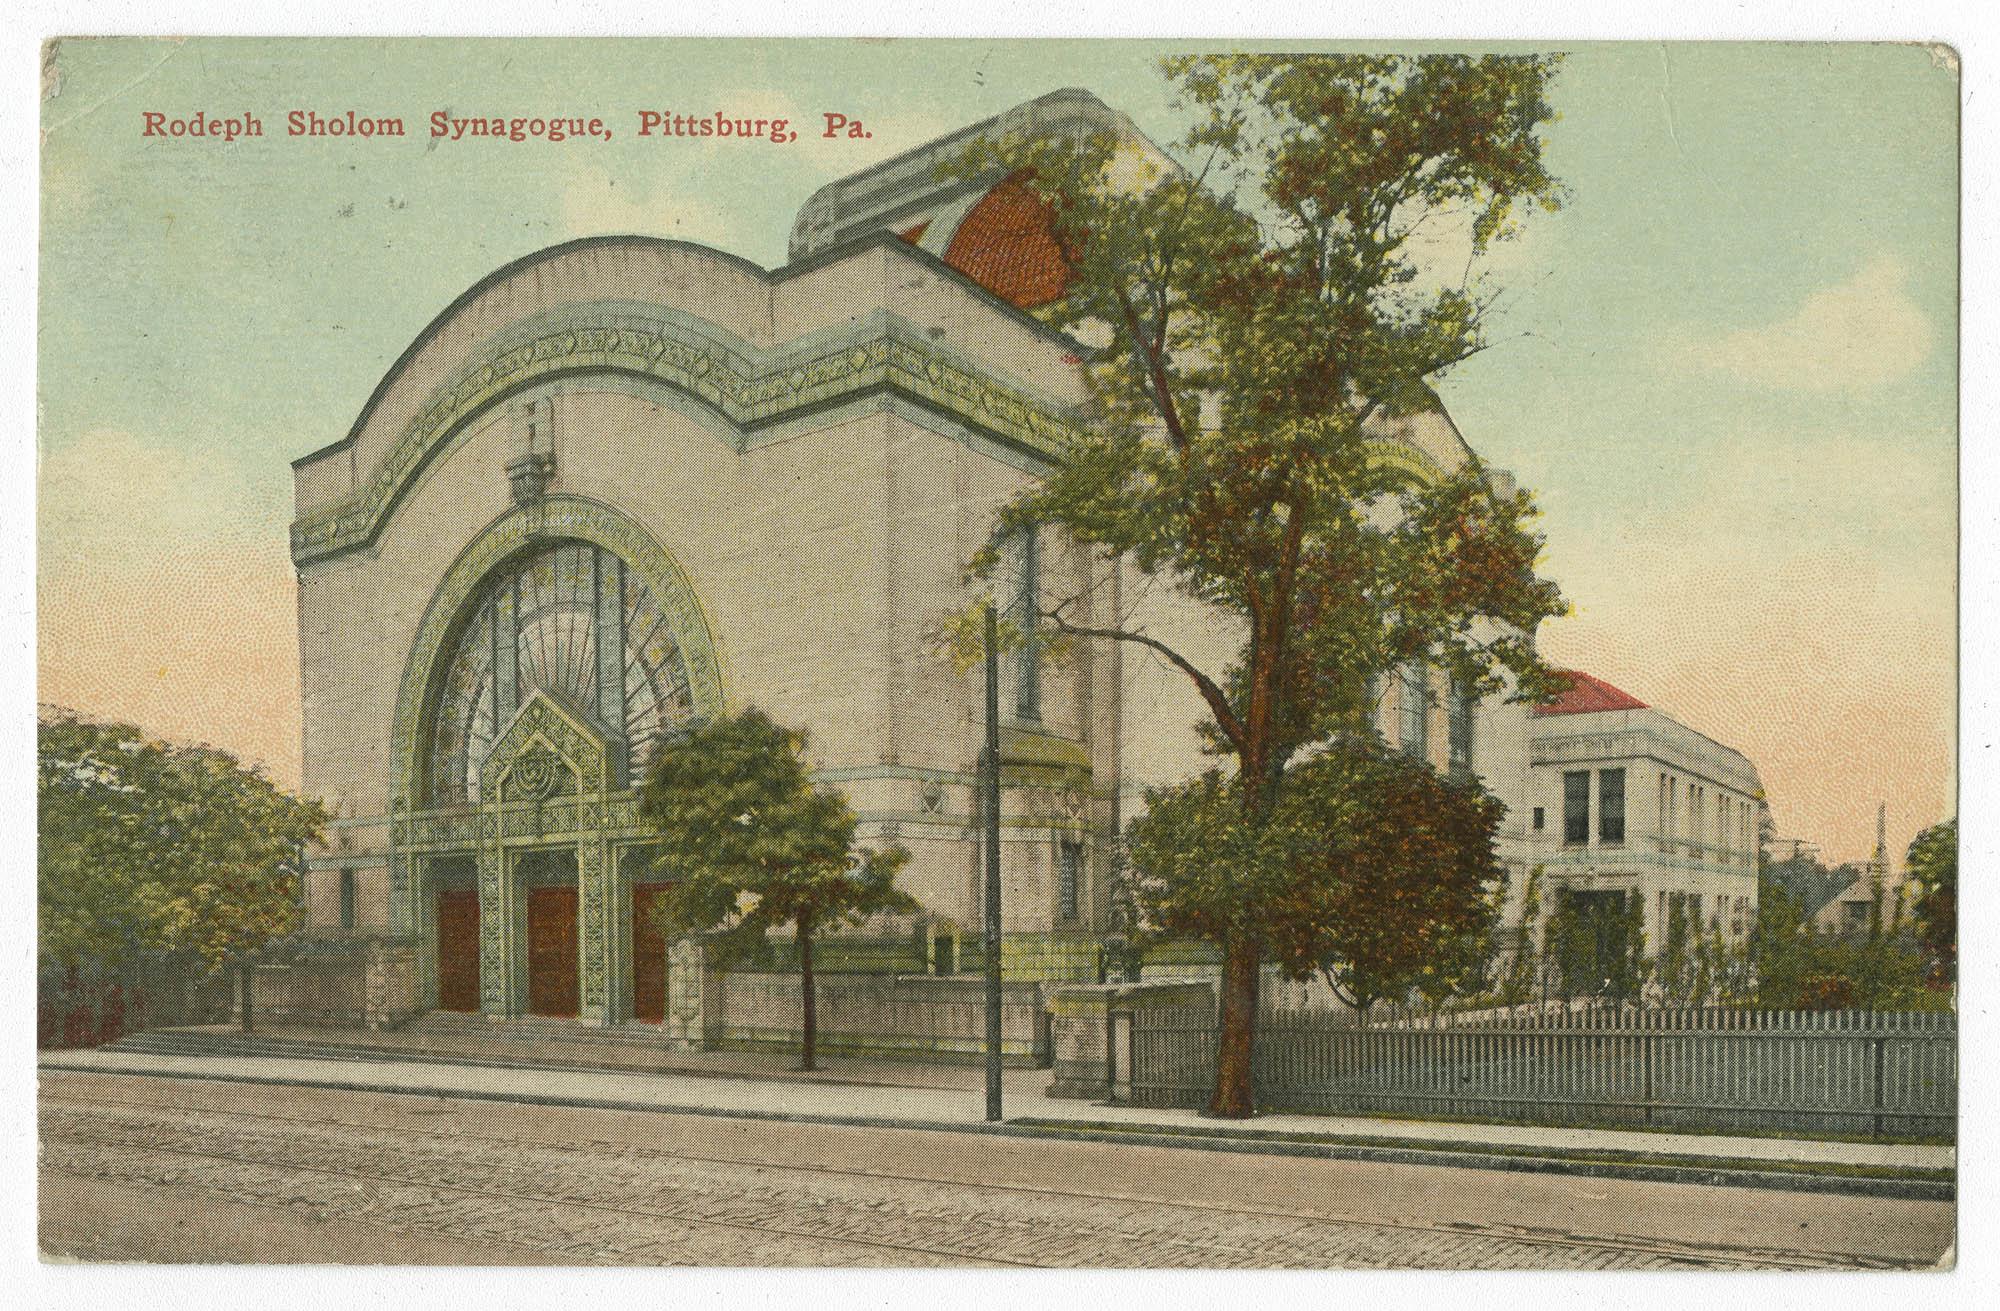 Rodeph Sholom Synagogue, Pittsburg, Pa.